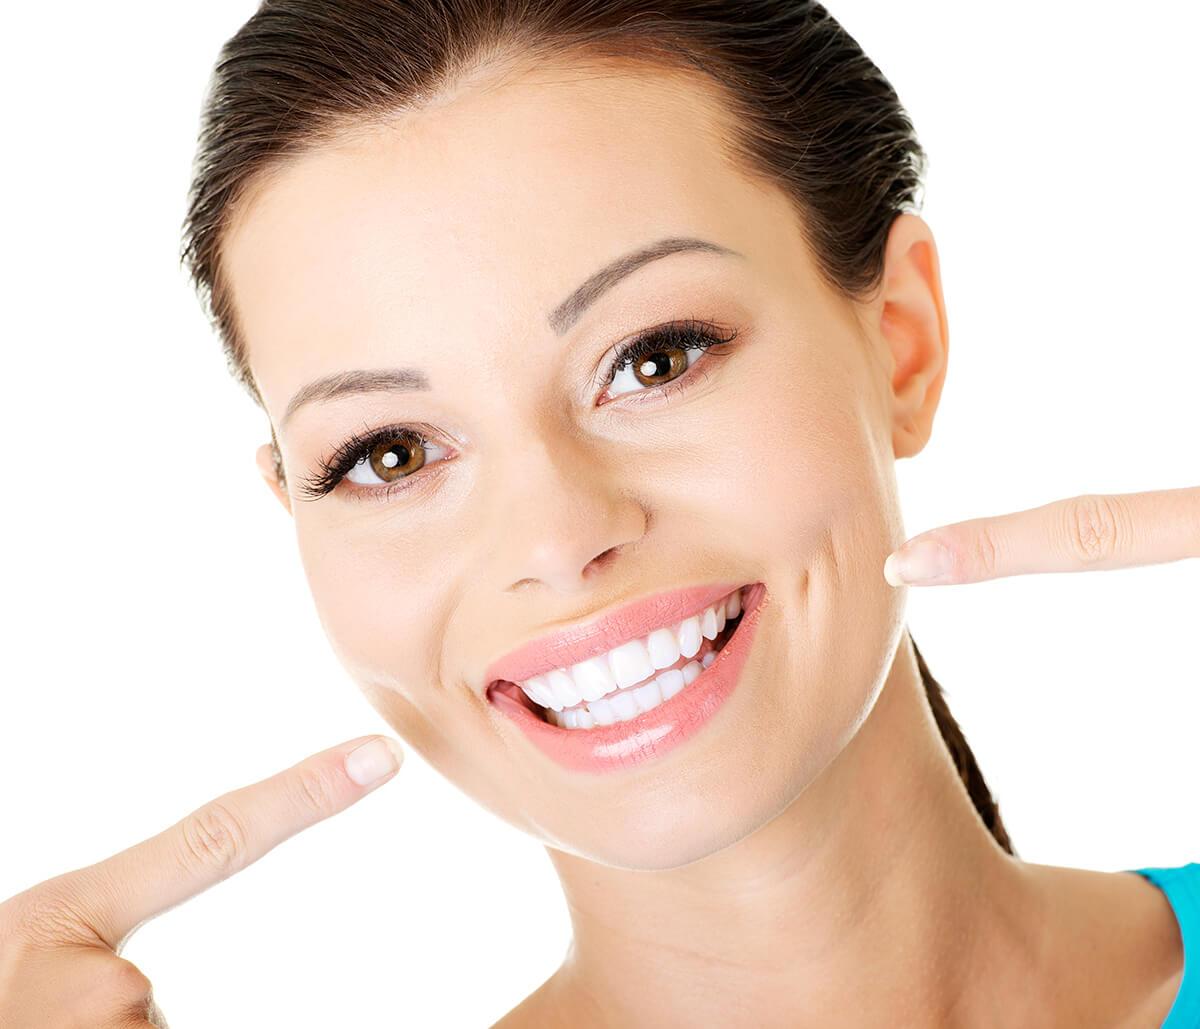 Cosmetic Dentist with Dr. Arellano in San Francisco CA Area